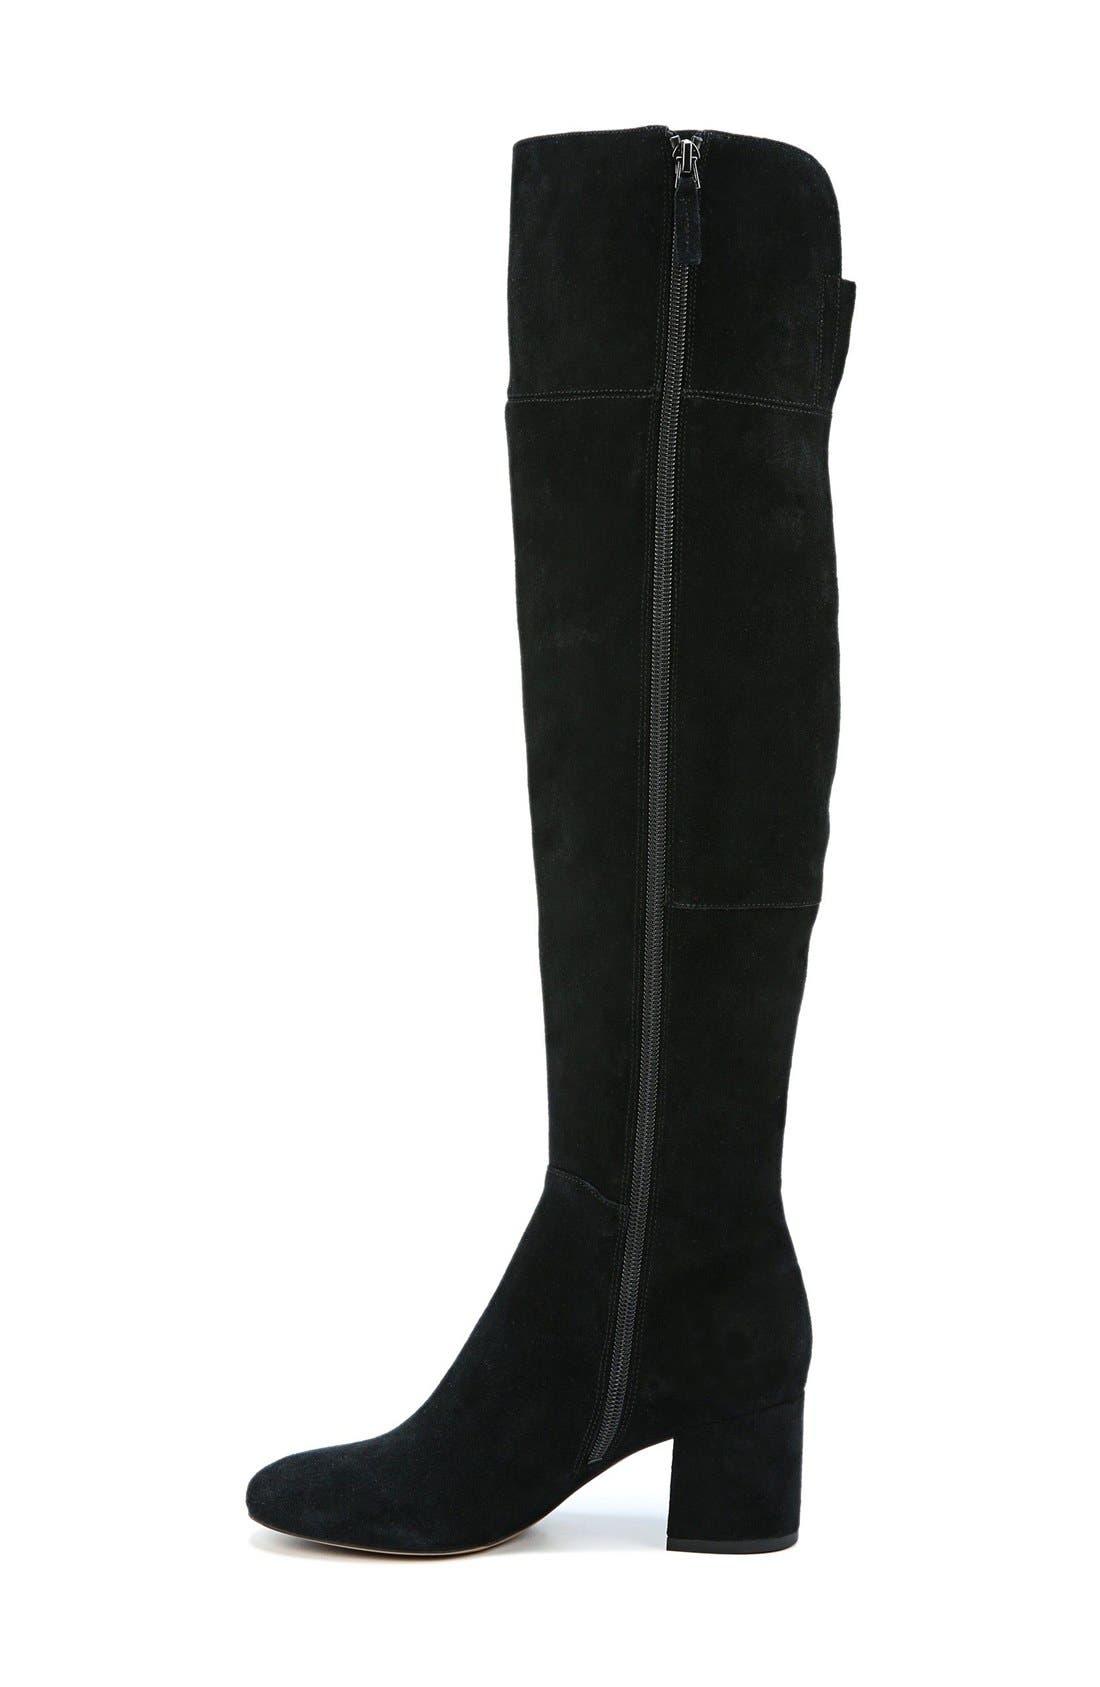 Alternate Image 2  - Franco Sarto Kerri Over the Knee Boot (Women)